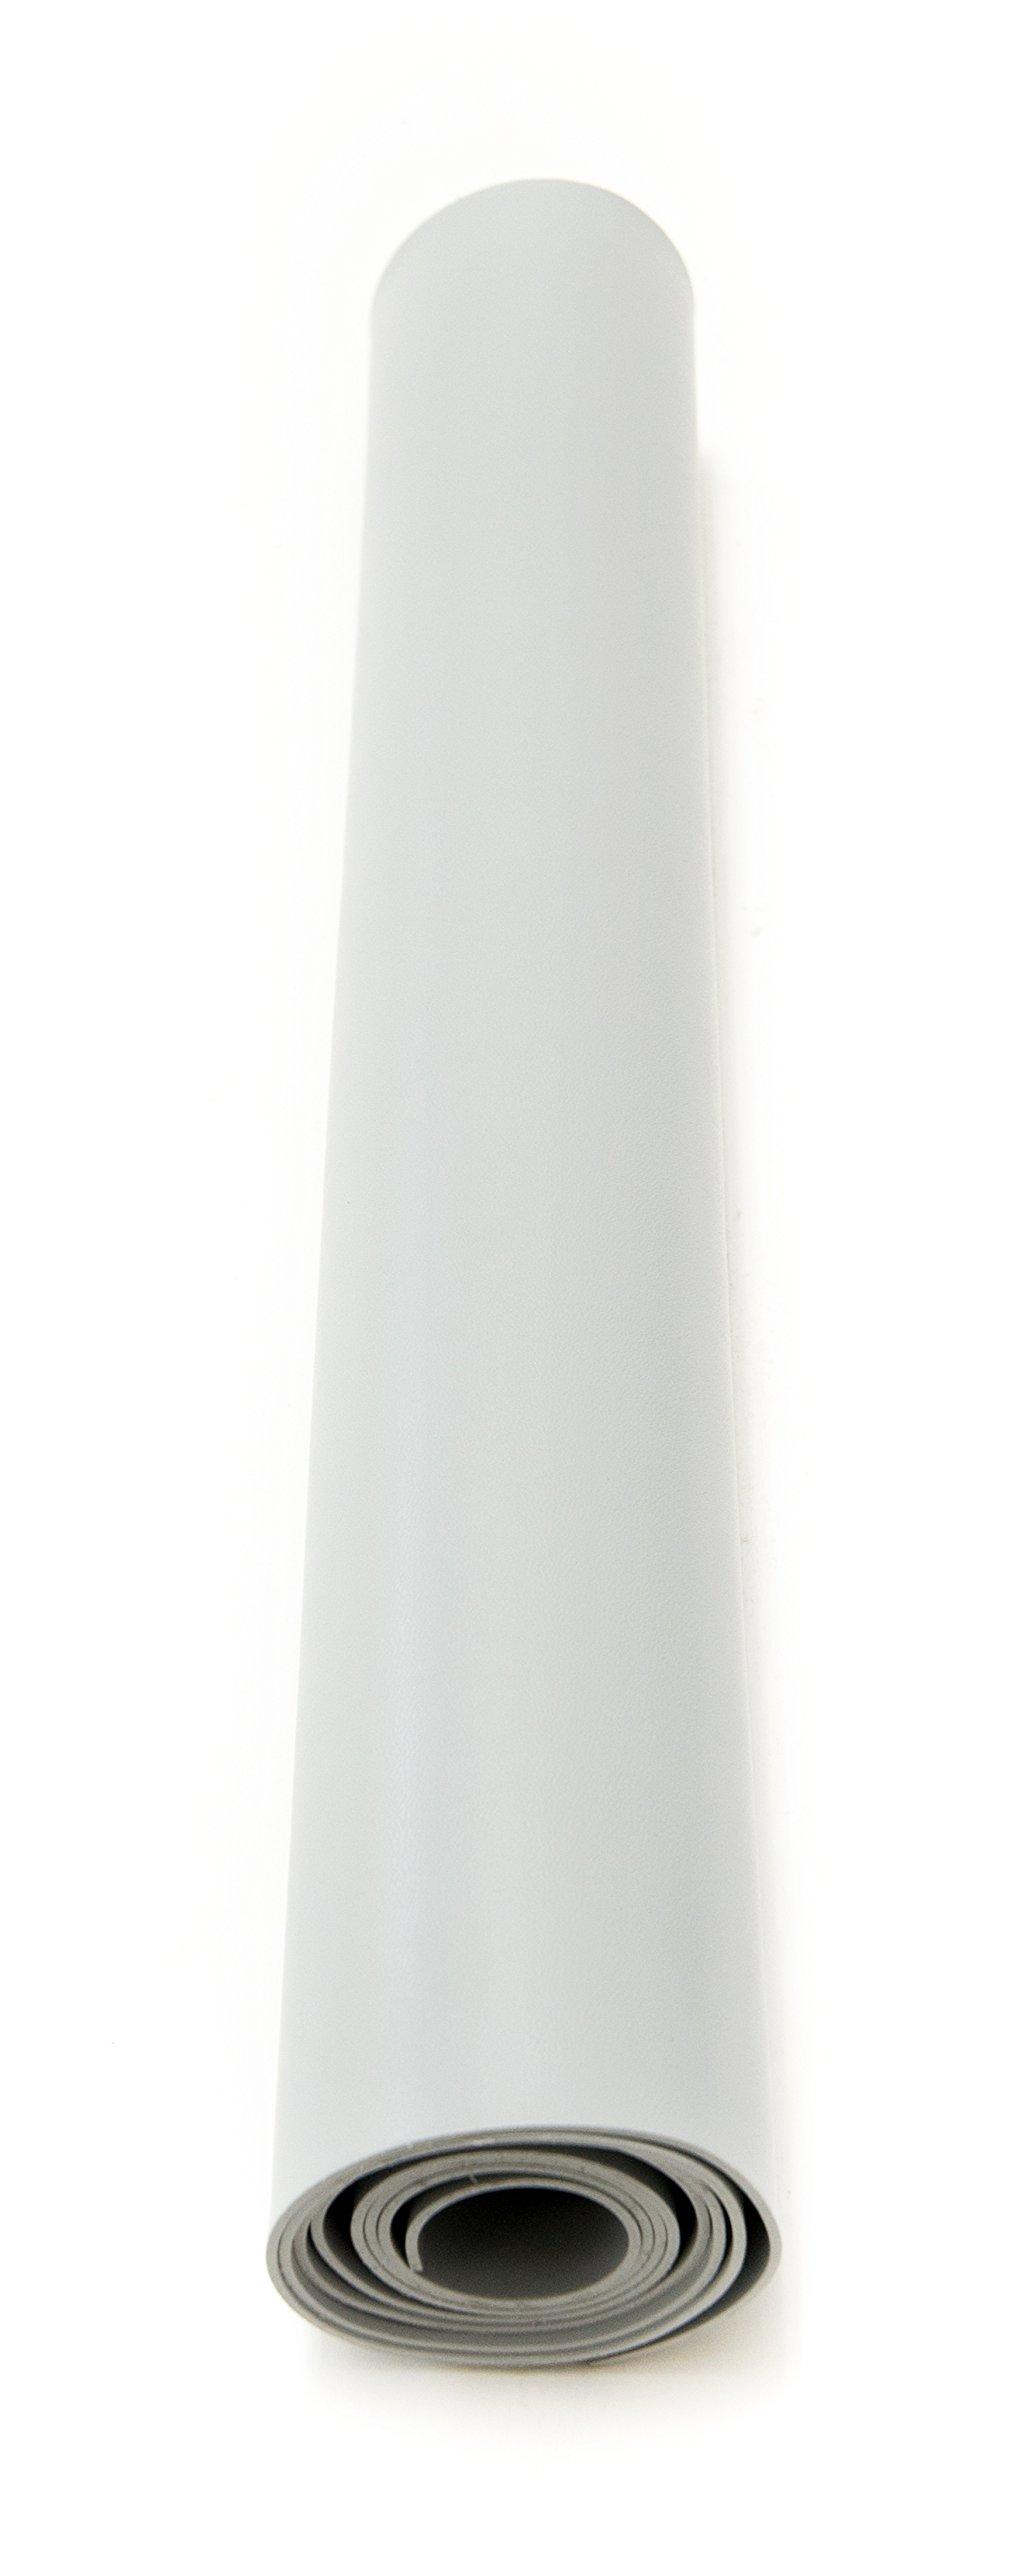 Bertech ESD Mat Roll, 2' Wide x 20' Long x 0.093'' Thick, Gray (Made in USA) by Bertech (Image #2)